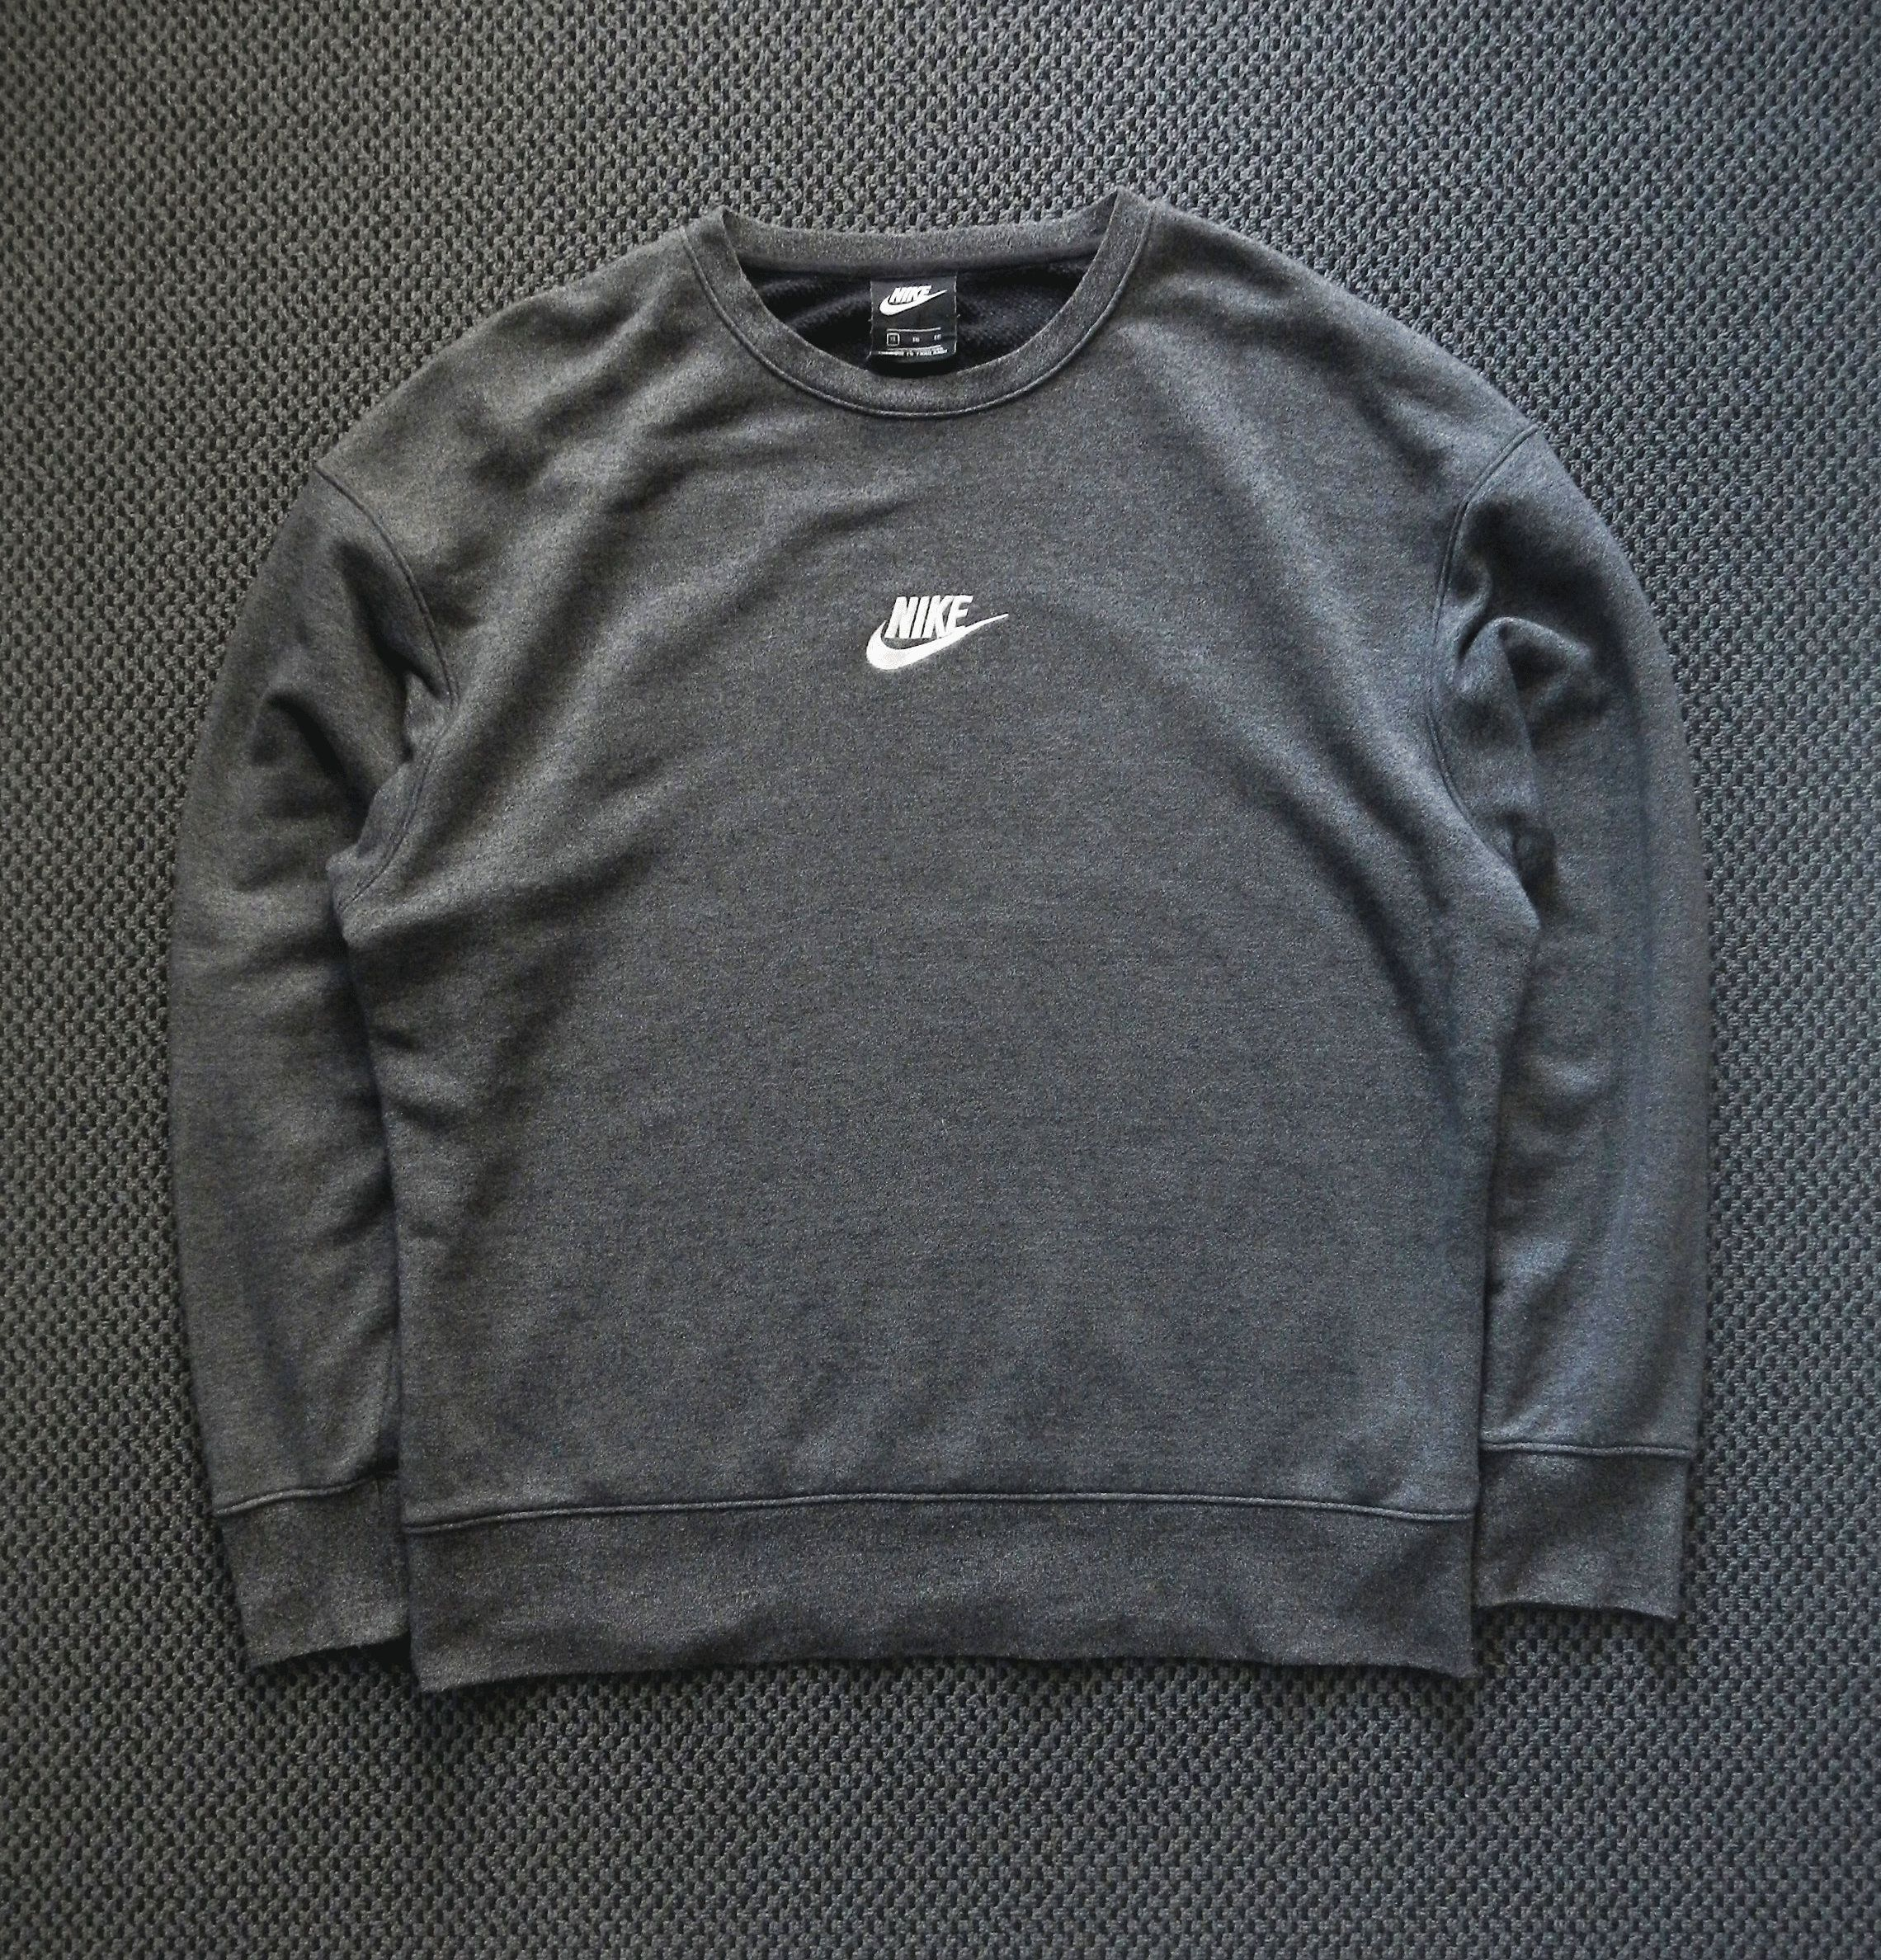 Rare Vintage Stone Island Button Up Shirt Free Shipping Etsy Free Shirts Sweatshirts Clothes Encounters [ 2376 x 2280 Pixel ]